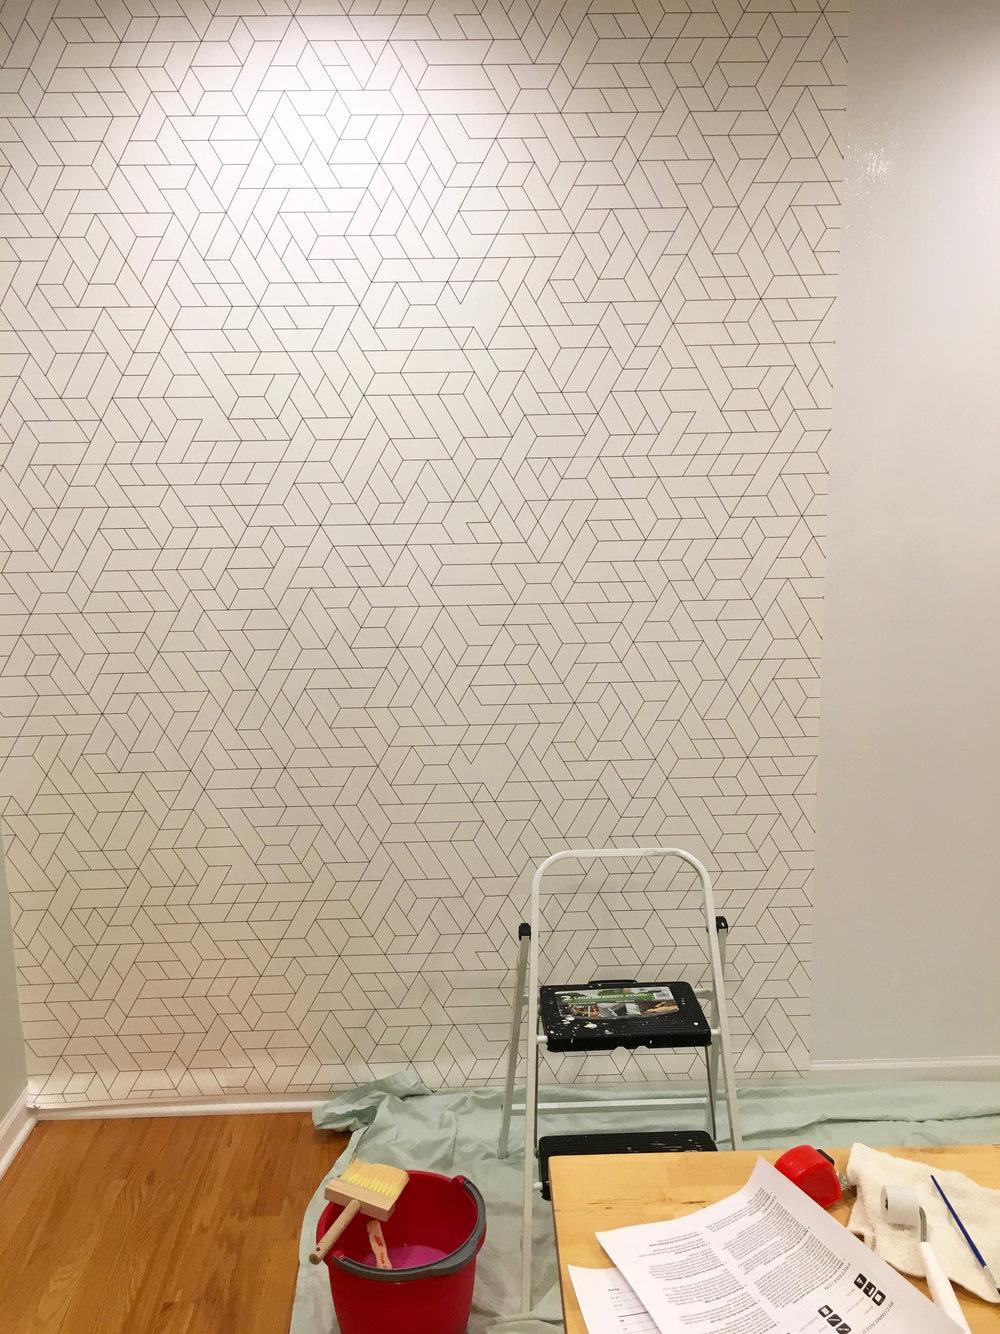 Photowall Wallpaper Being Hung